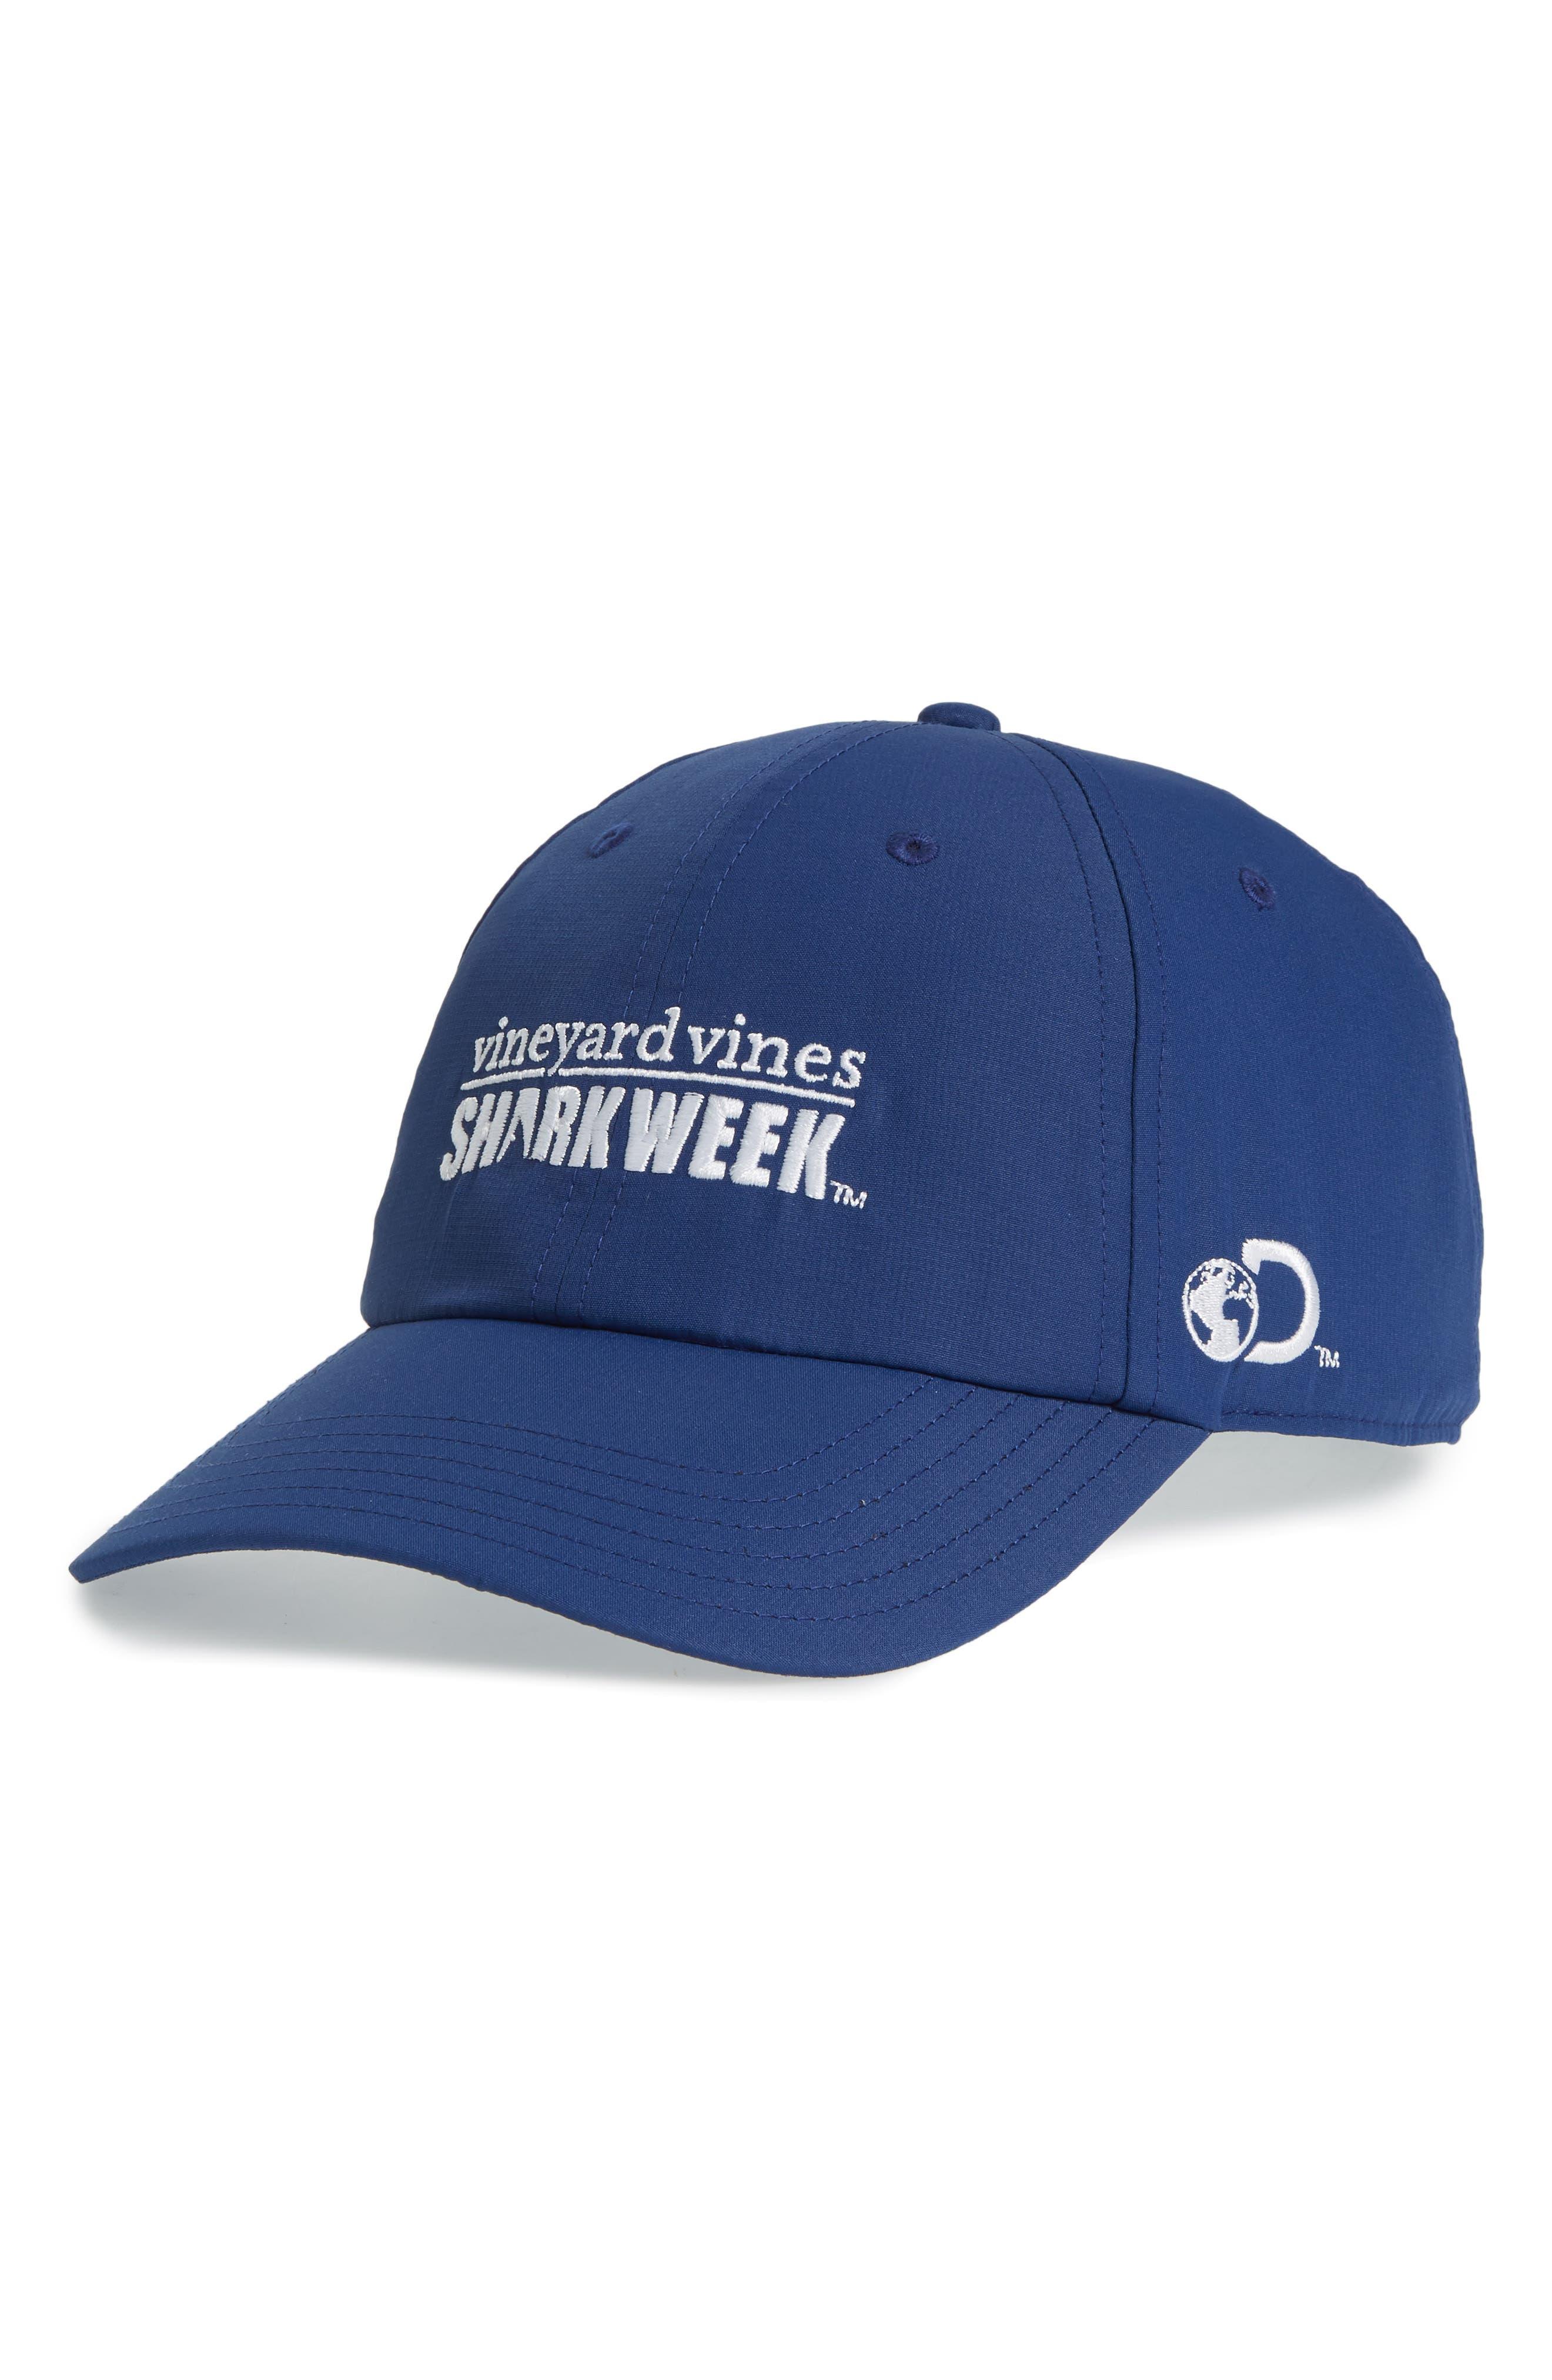 VINEYARD VINES x Shark Week<sup>™</sup> Performance Baseball Cap, Main, color, 461